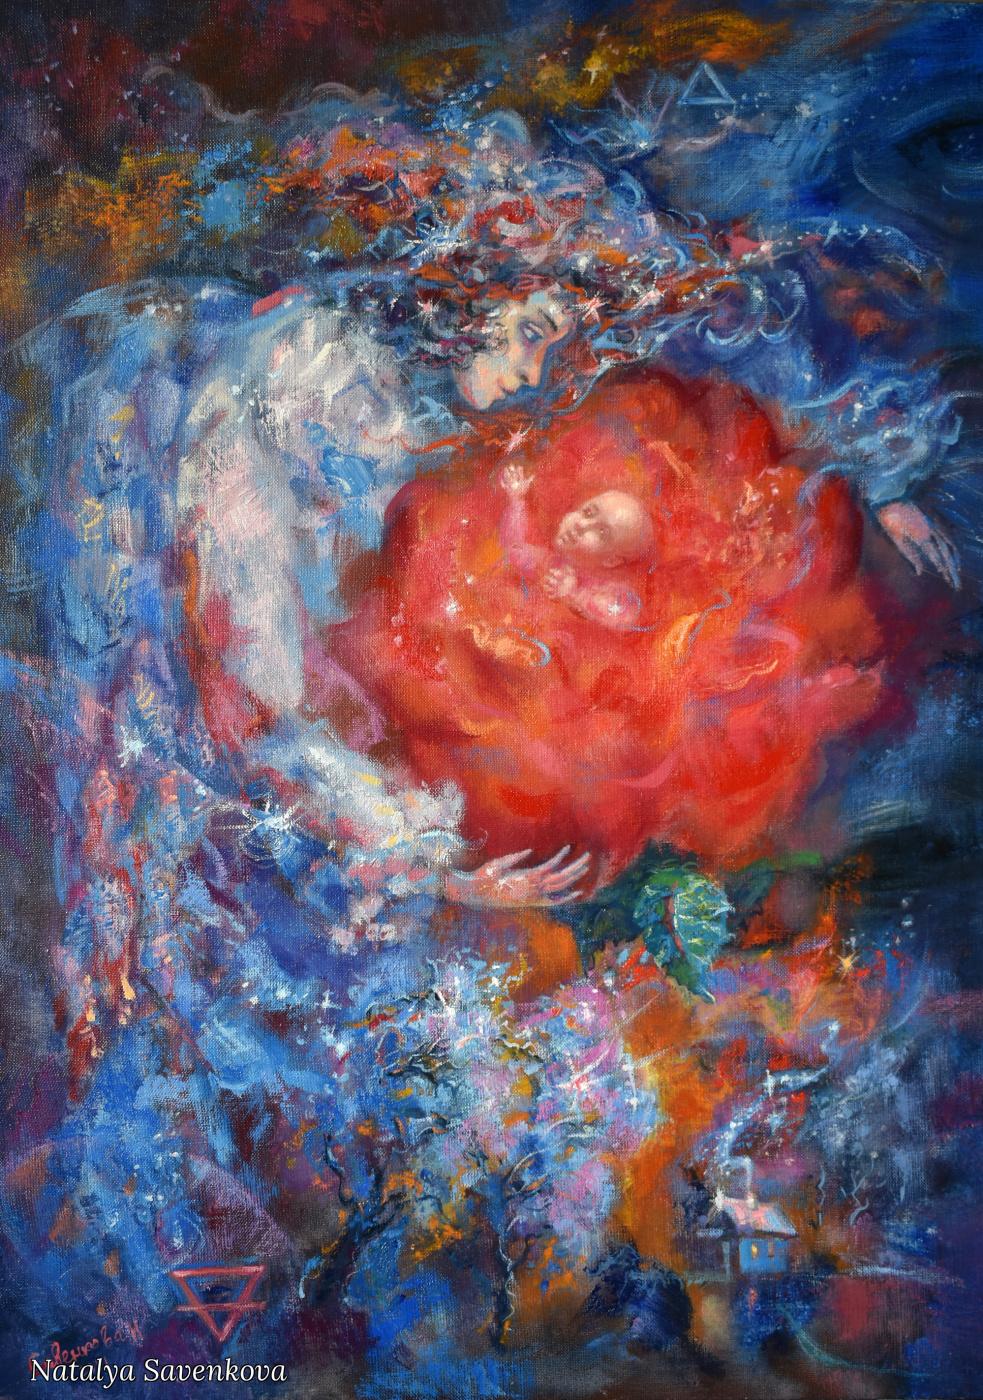 Natalya Savenkova. Elements of Earth and Fire